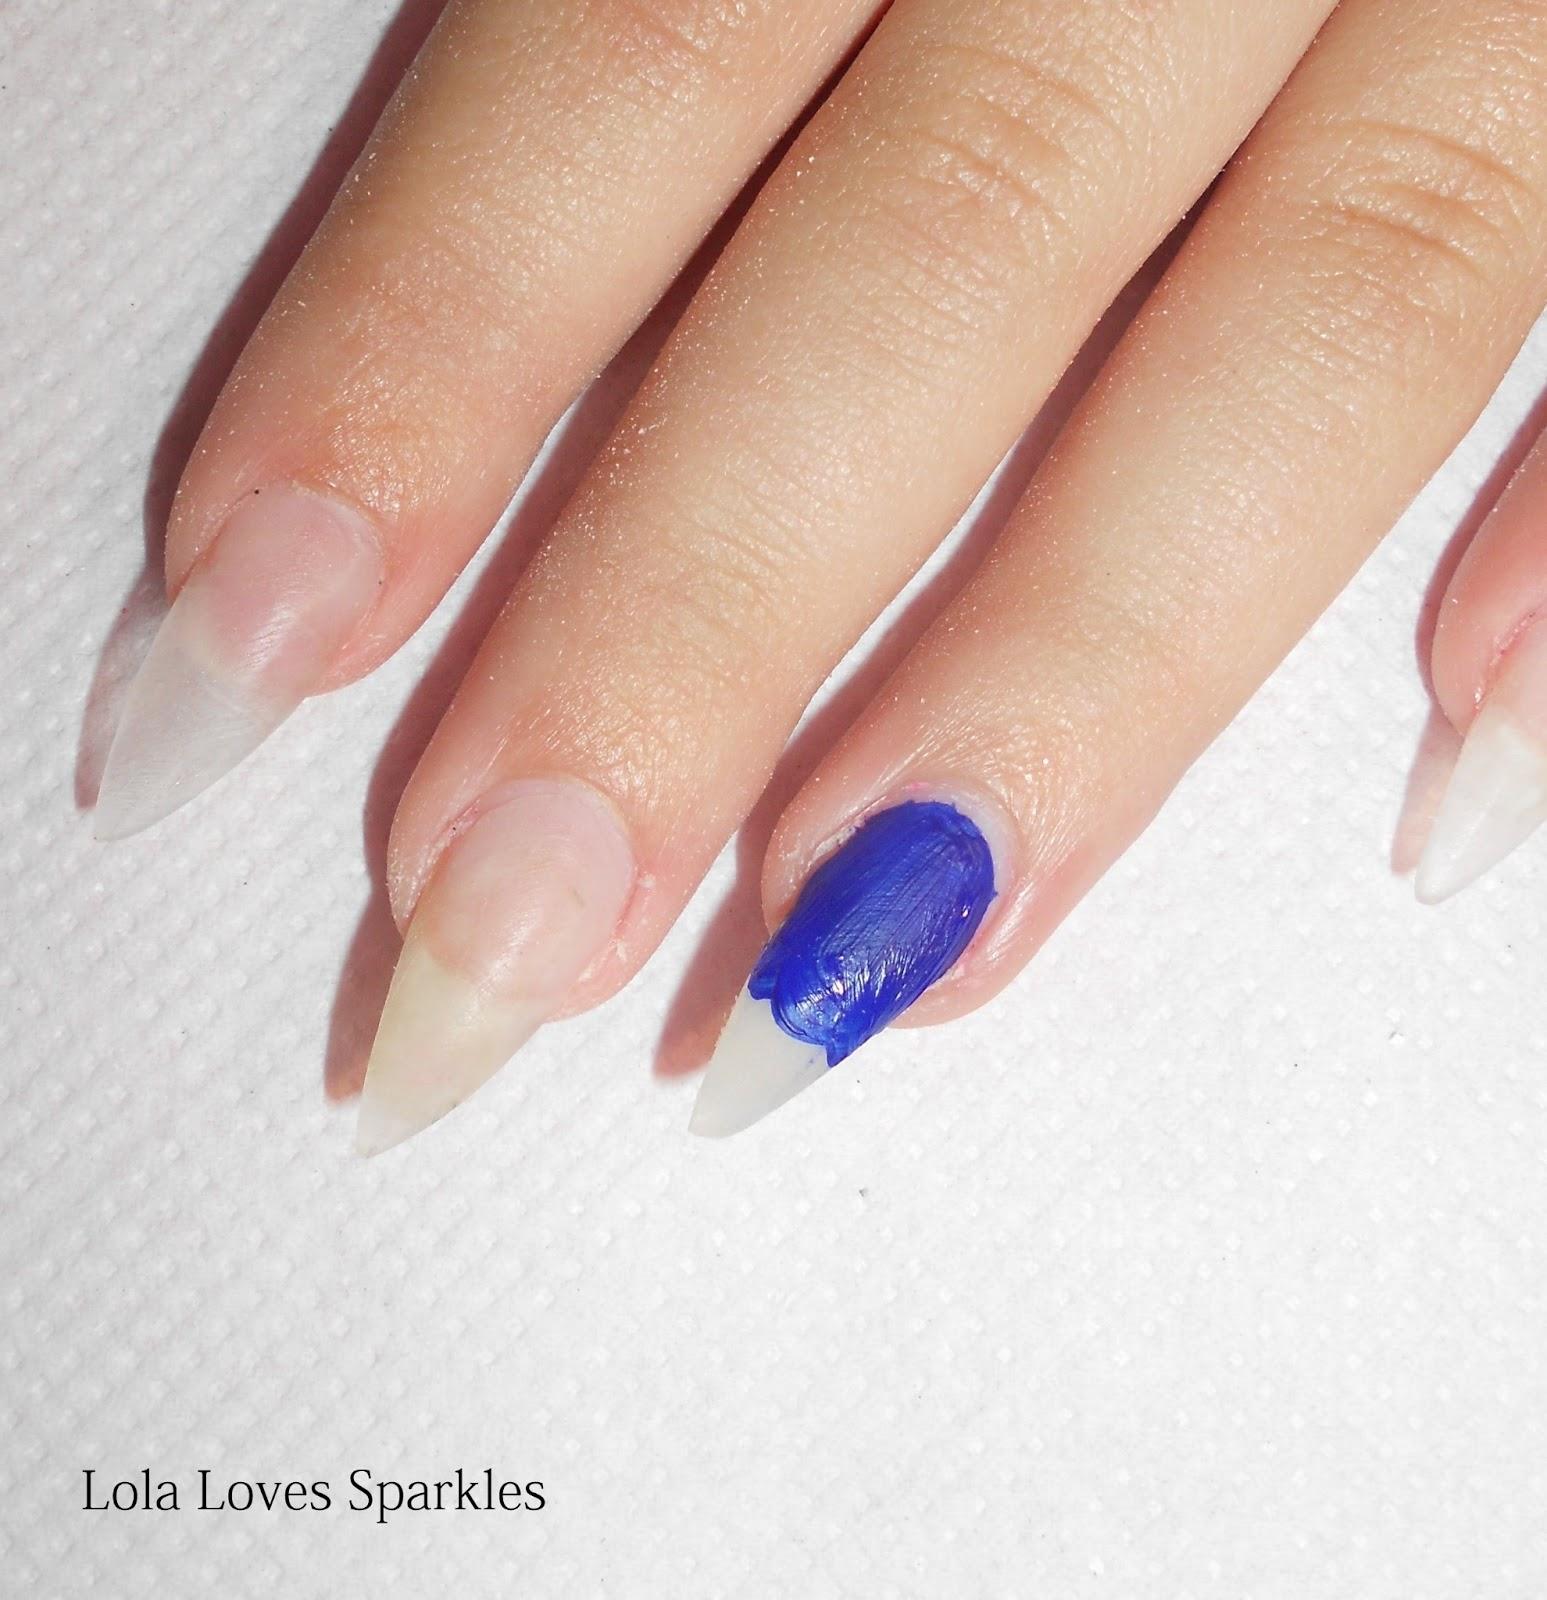 lola loves sparkles cute coloured pencils nail design